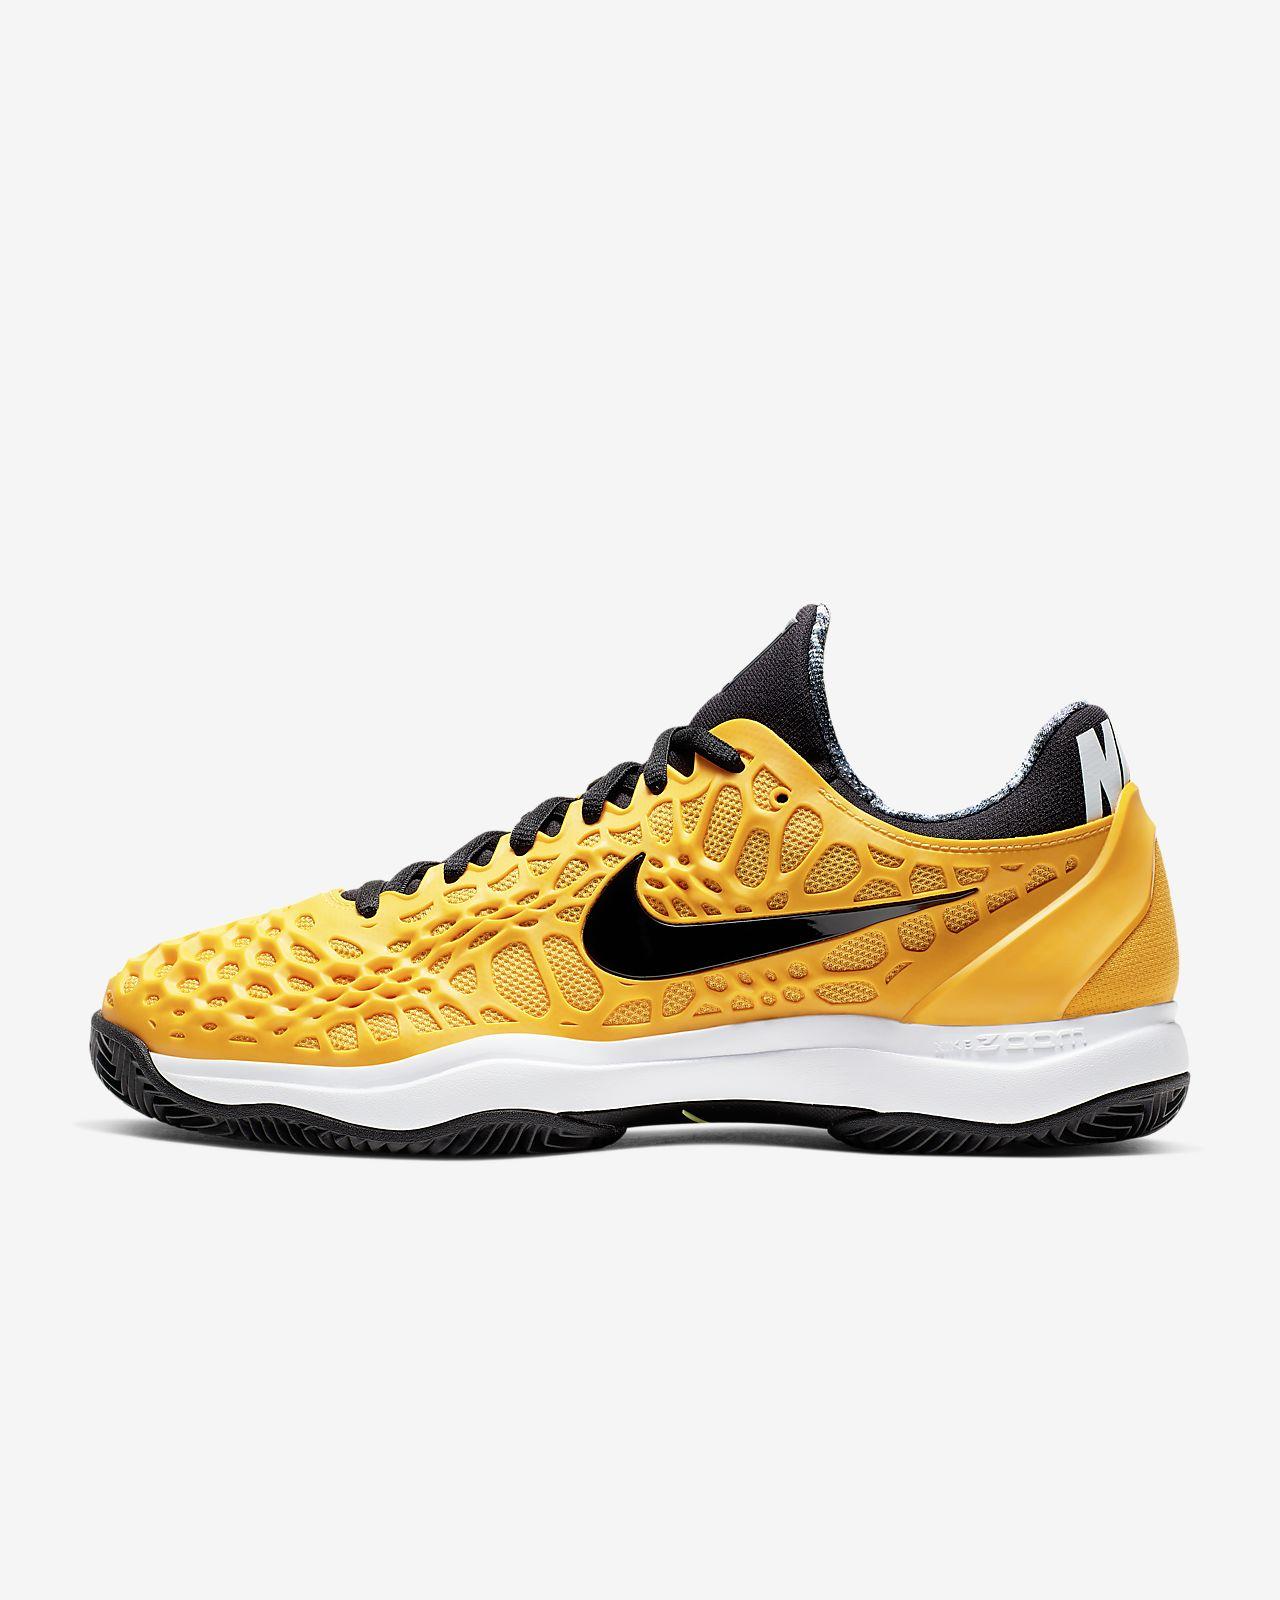 Nike Zoom Cage 3 Clay Men's Tennis Shoe